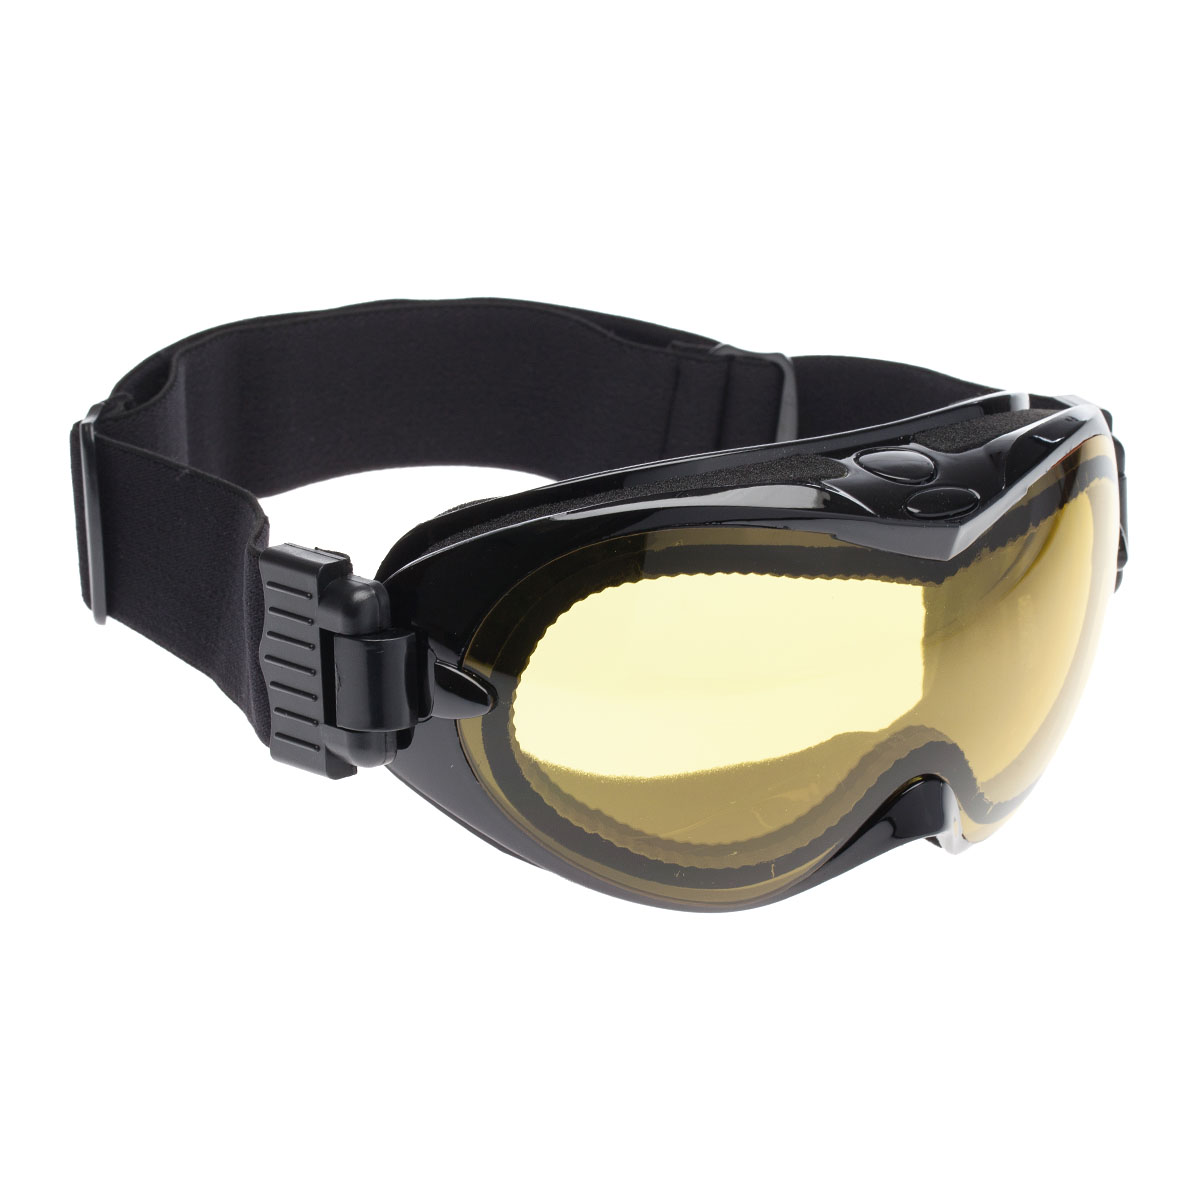 очки горнолыжные vcan ag0172 vse64 Горнолыжные очки Exparc, 15653-1